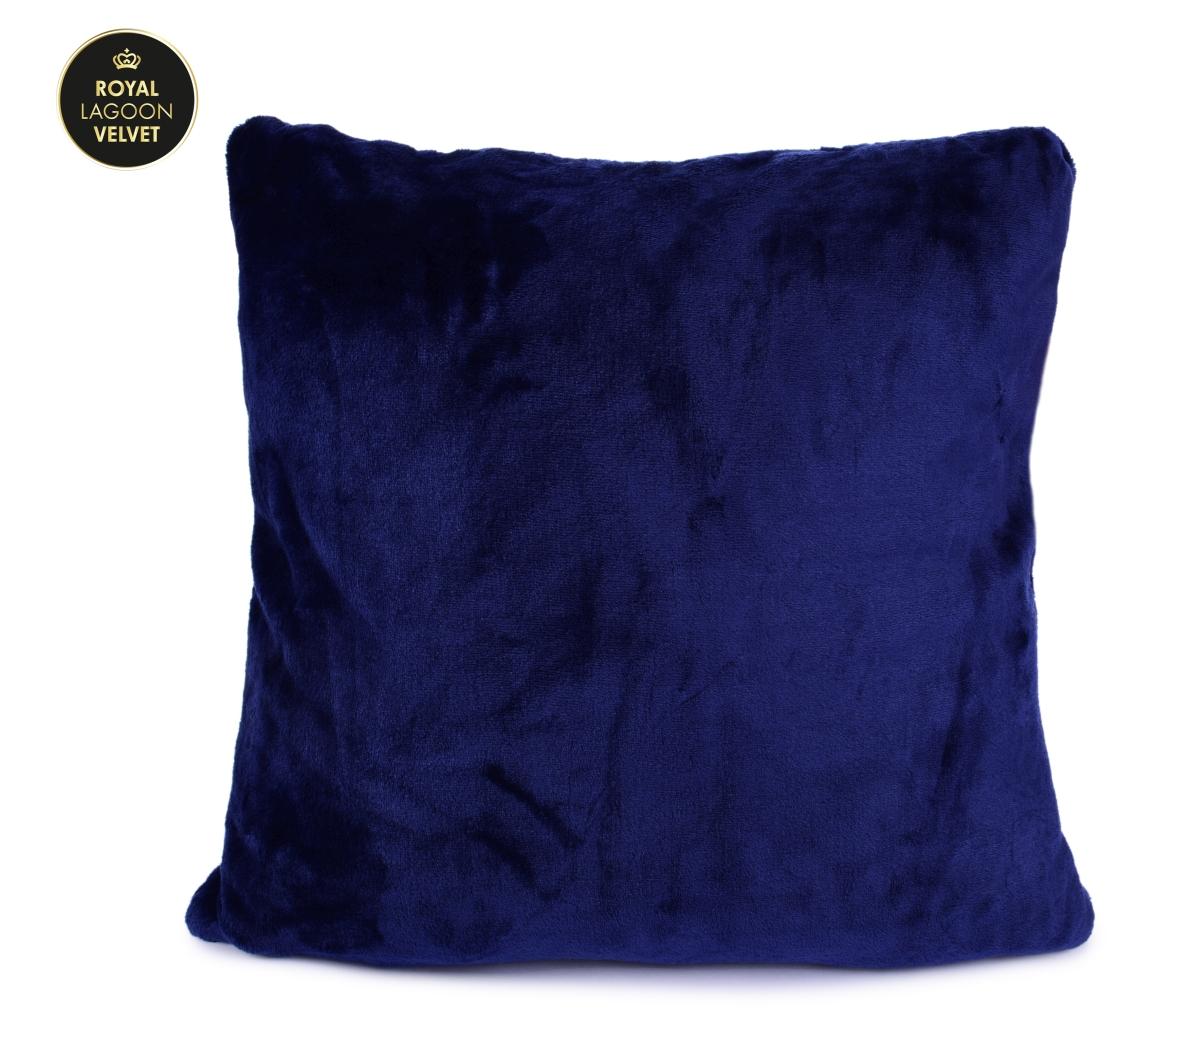 ROYAL LAGOON VELVET potah na polštář královsky modrý